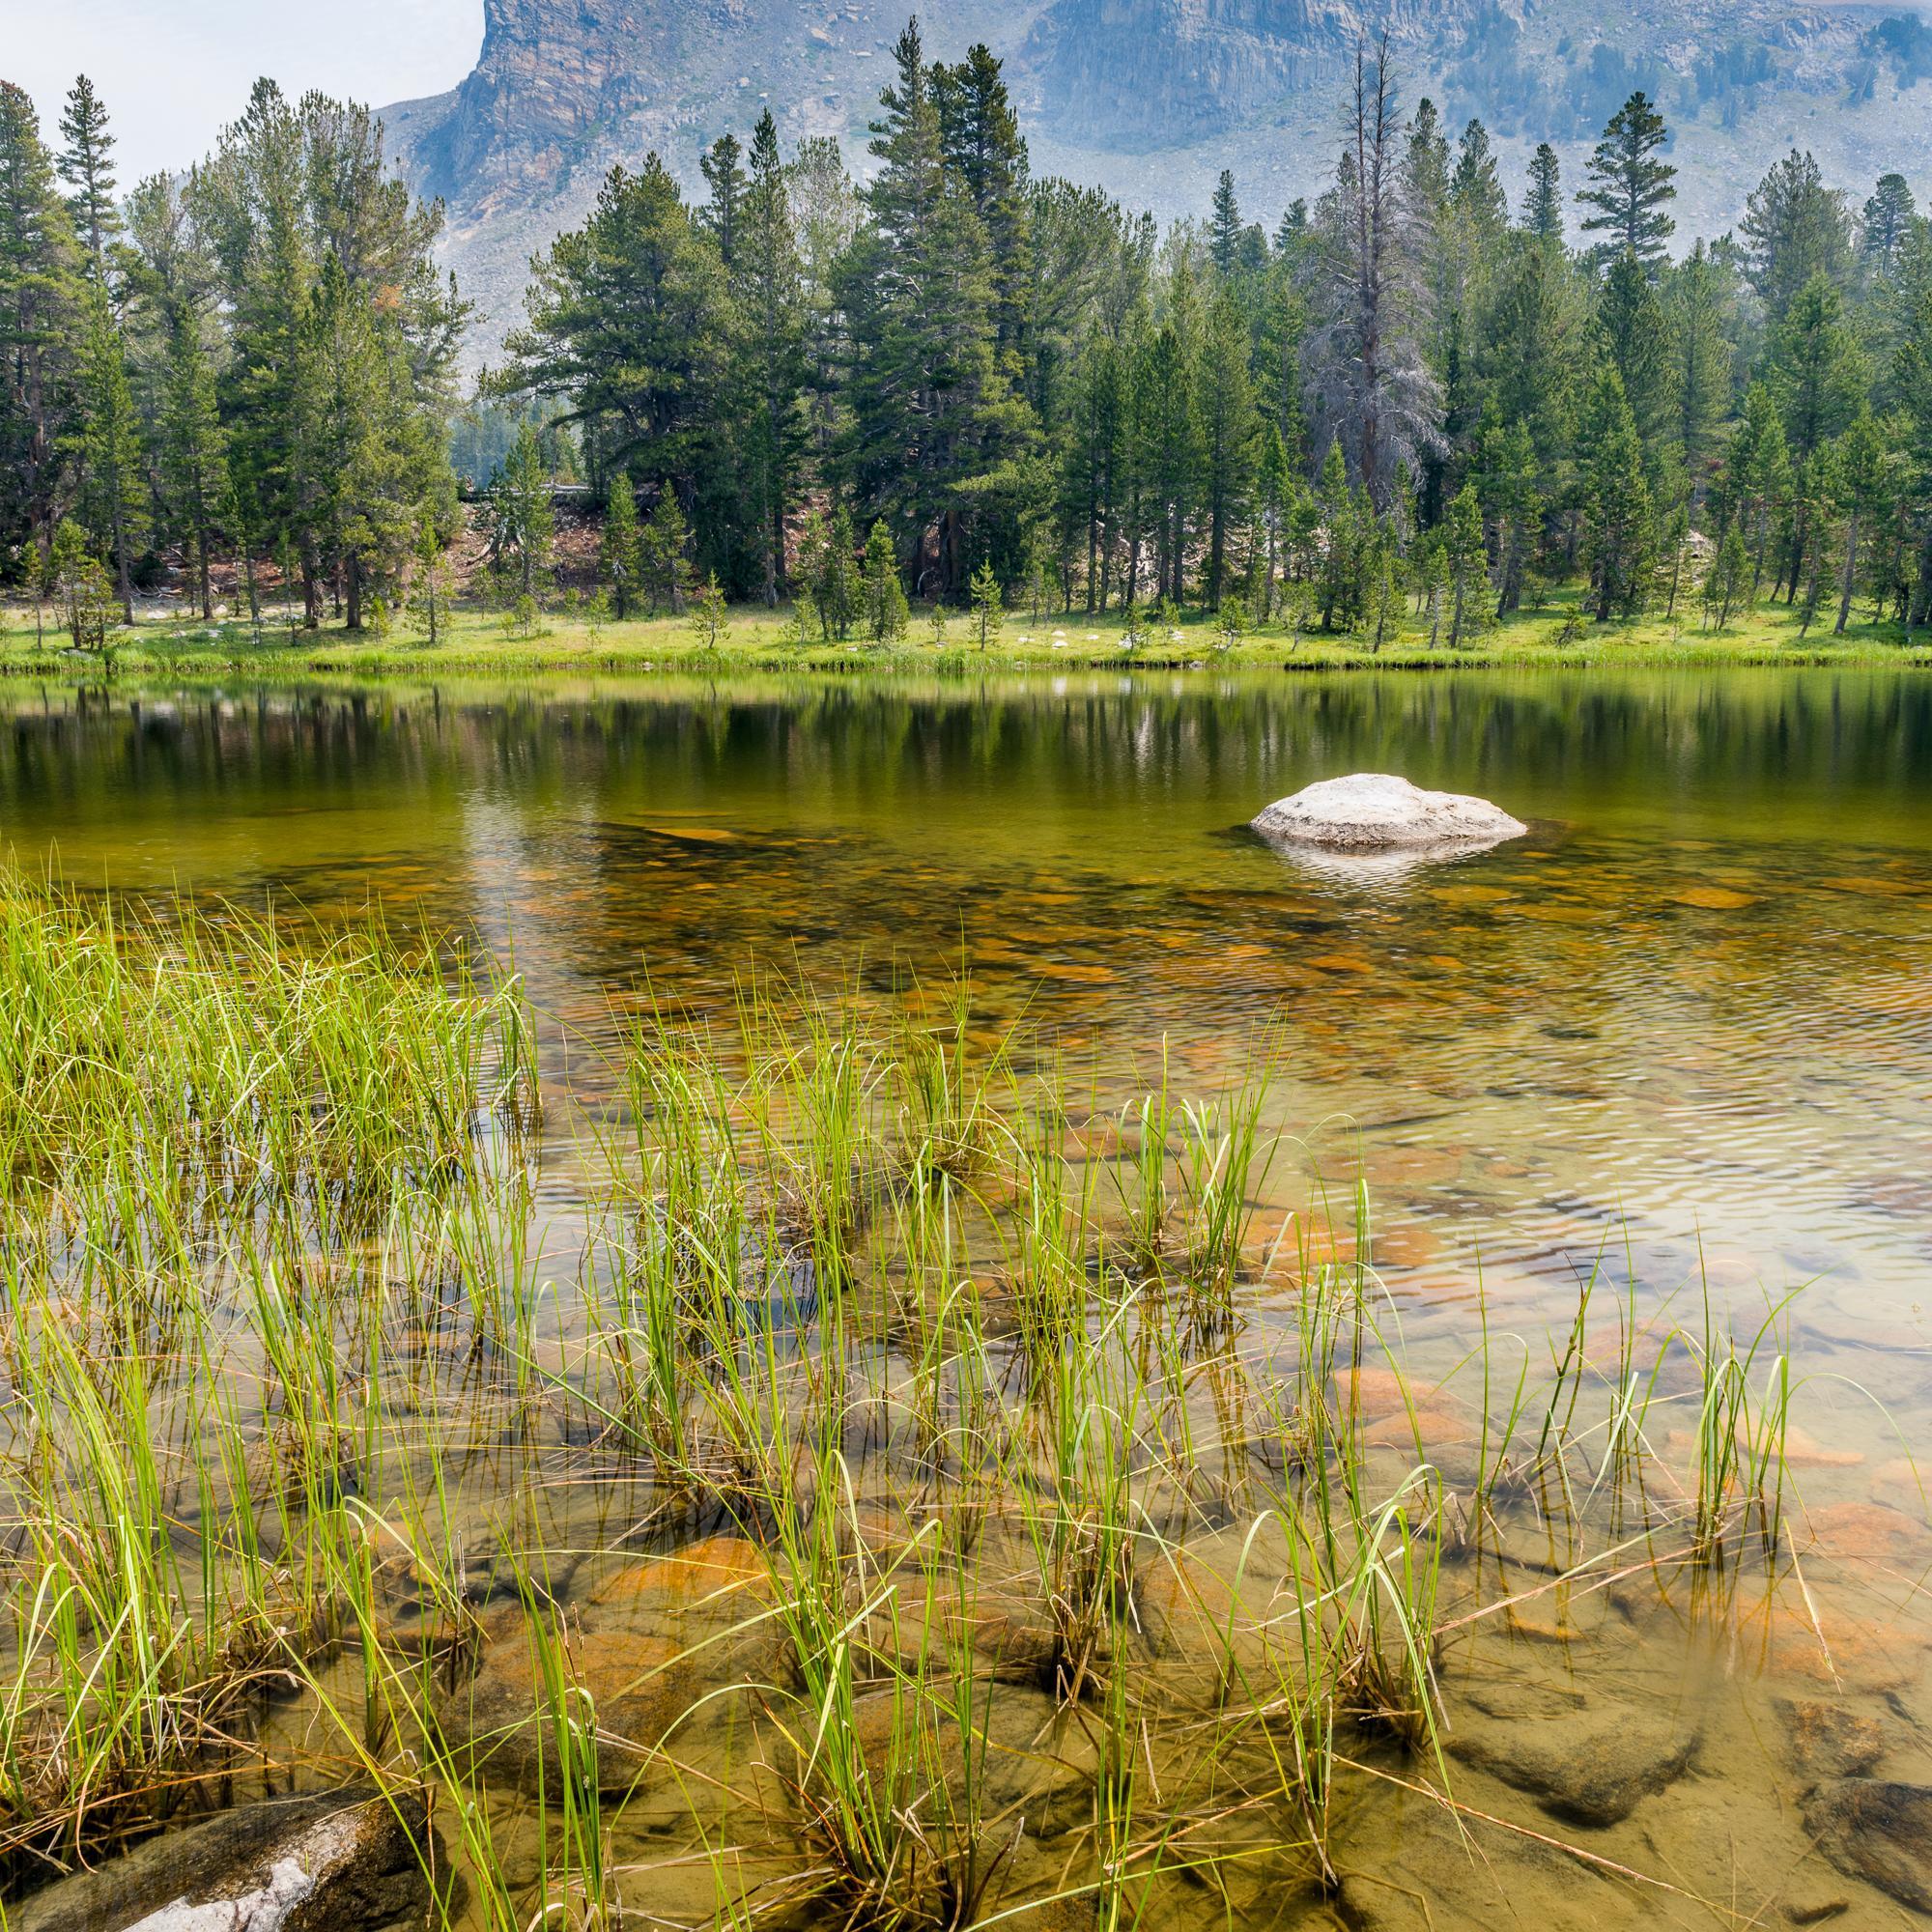 Mount Dana Trail, Yosemite